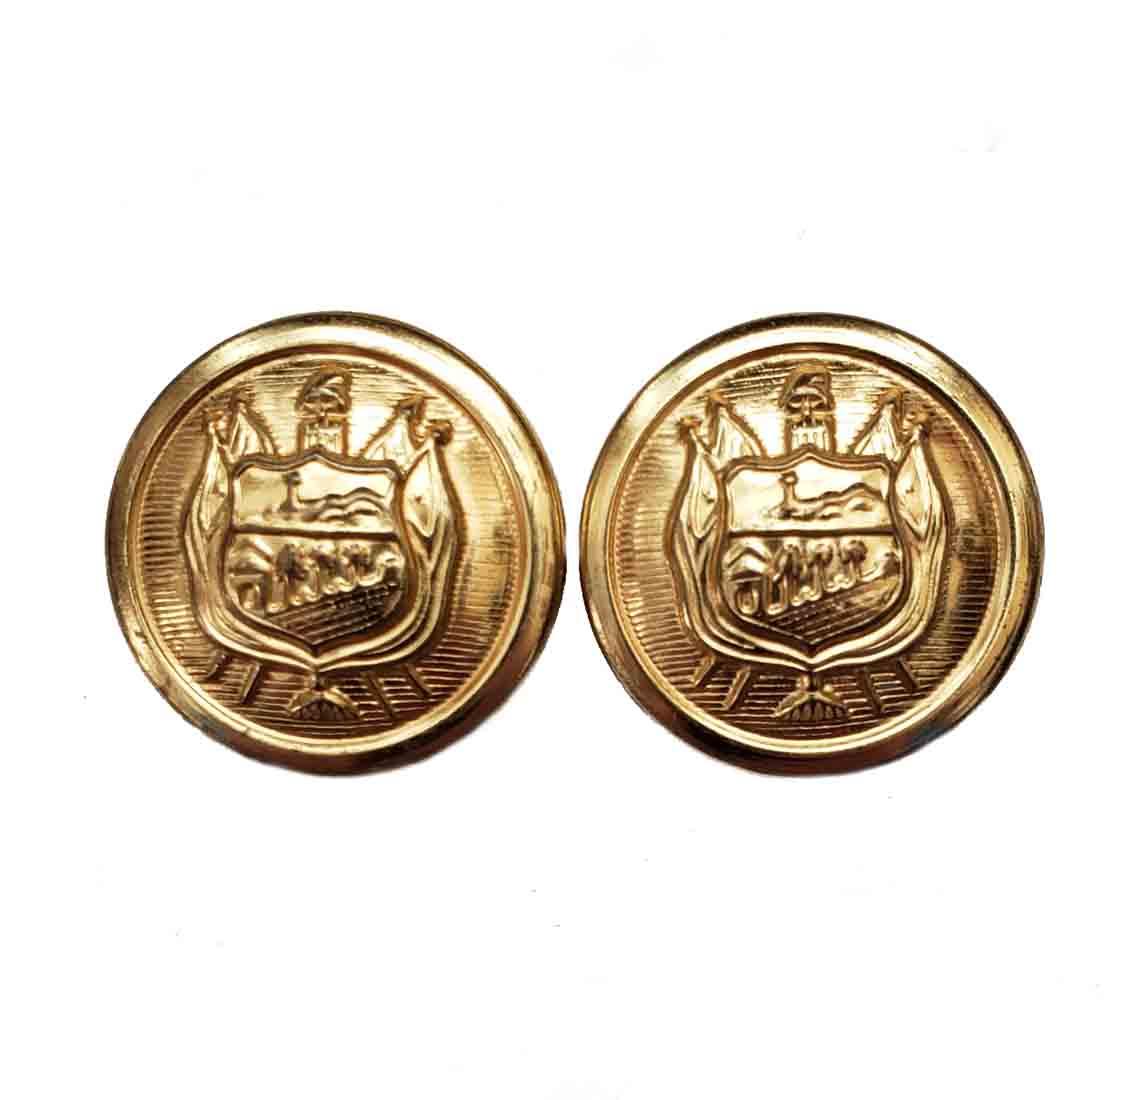 Two Vintage Stanley Blacker Blazer Buttons Gold Brass Shank Shield Pattern Men's 7/8